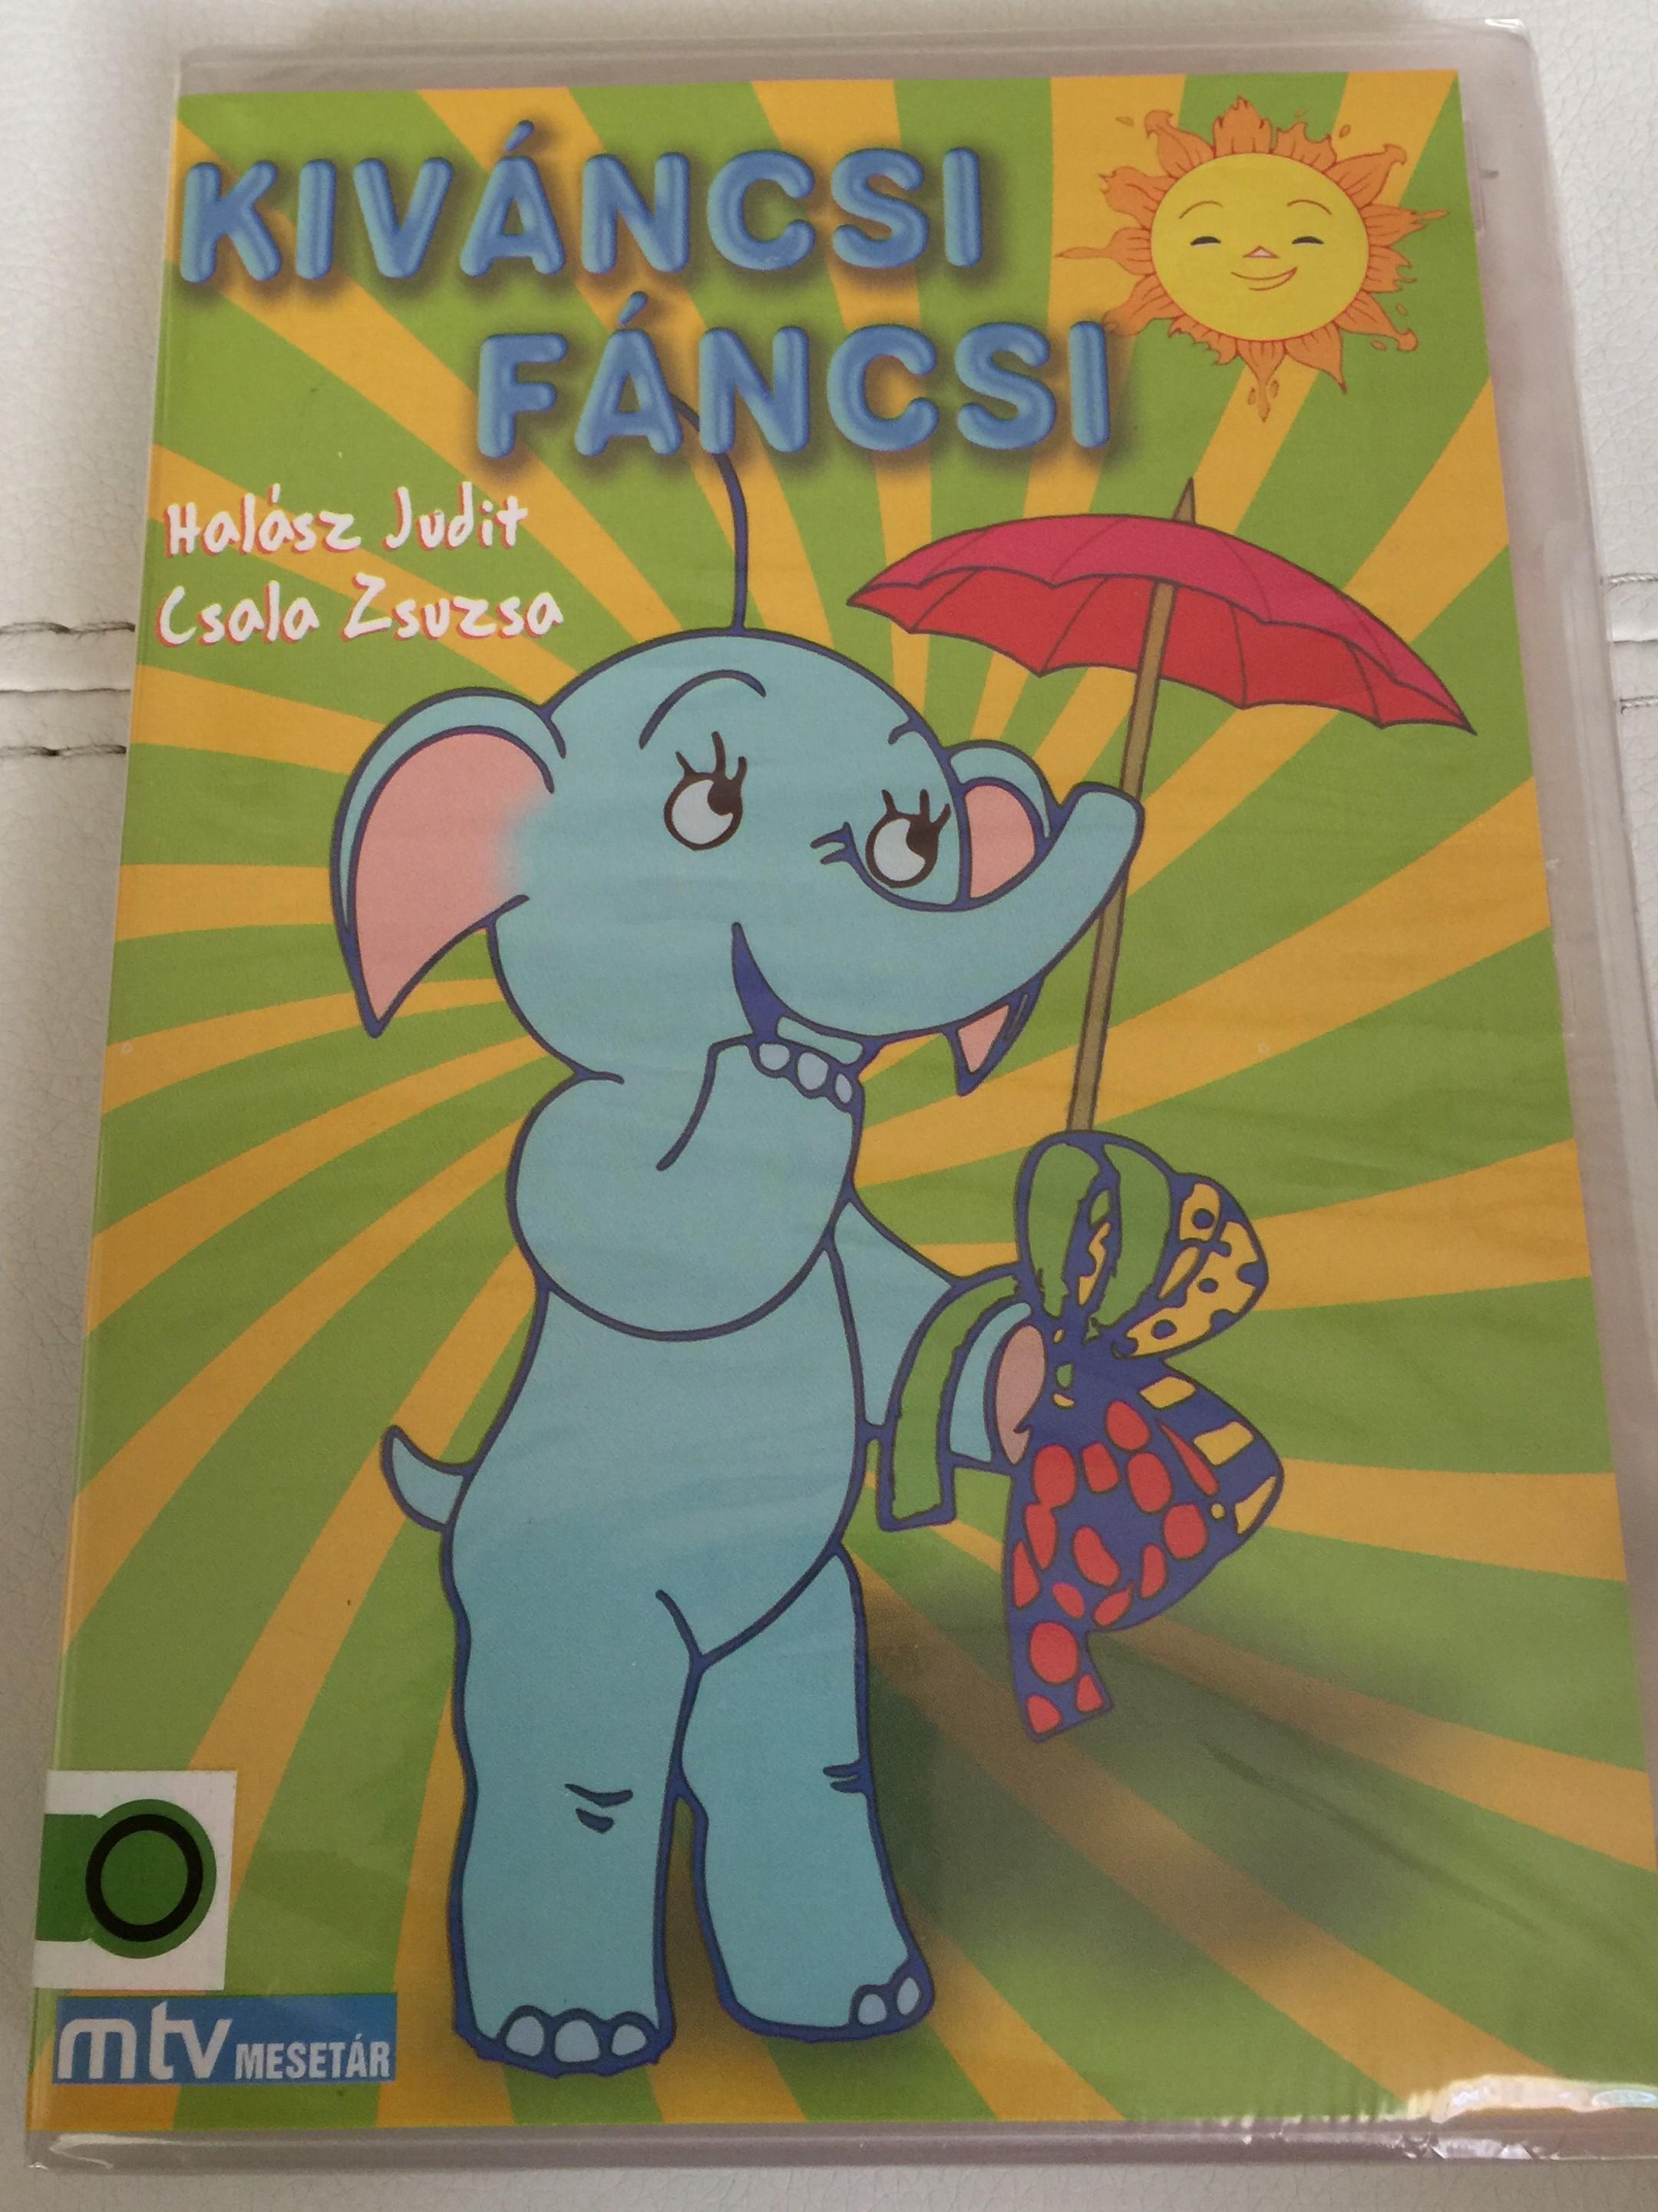 k-v-ncsi-f-ncsi-dvd-1989-hungarian-language-cartoon-series-directed-by-richly-zsolt-1.jpg